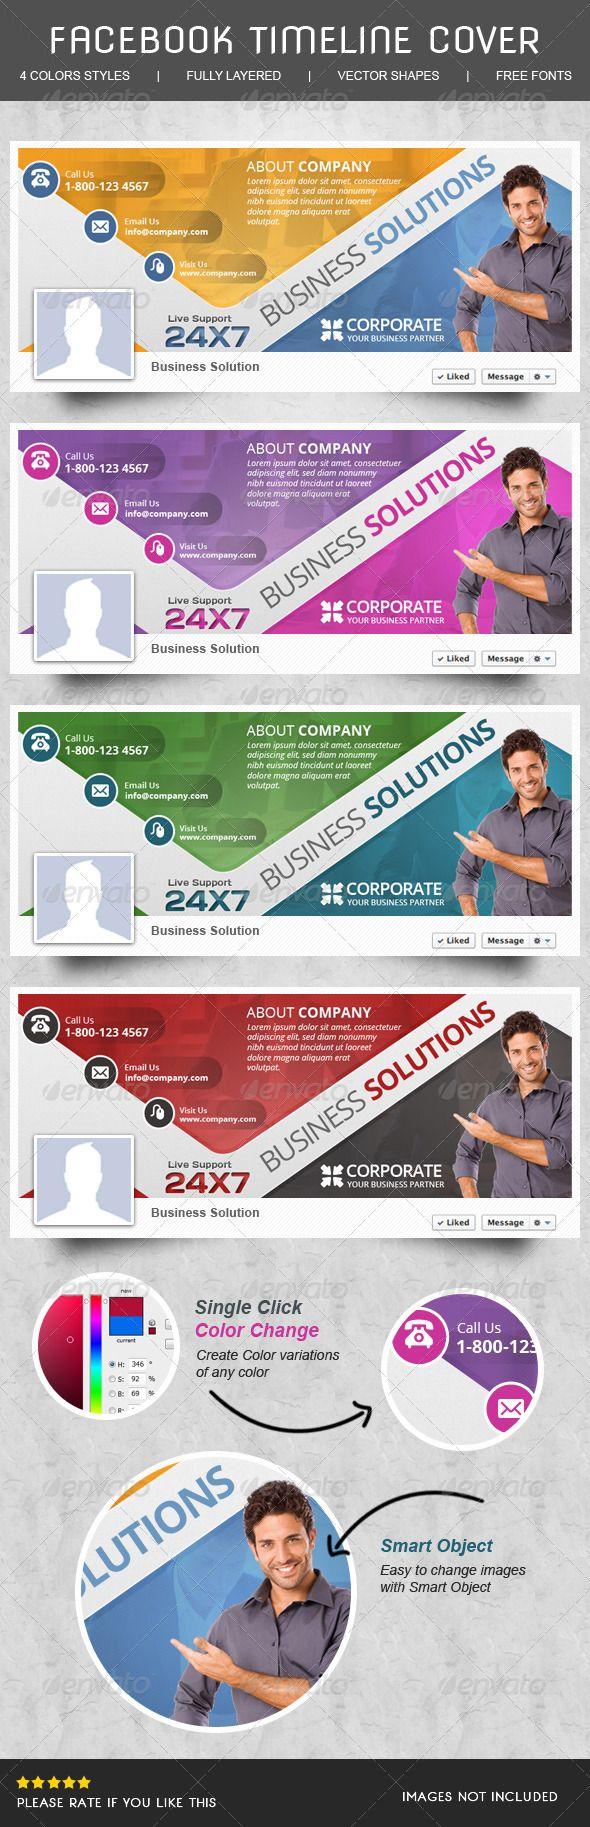 Corporate Facebook Timeline - Facebook Timeline Covers Social Media